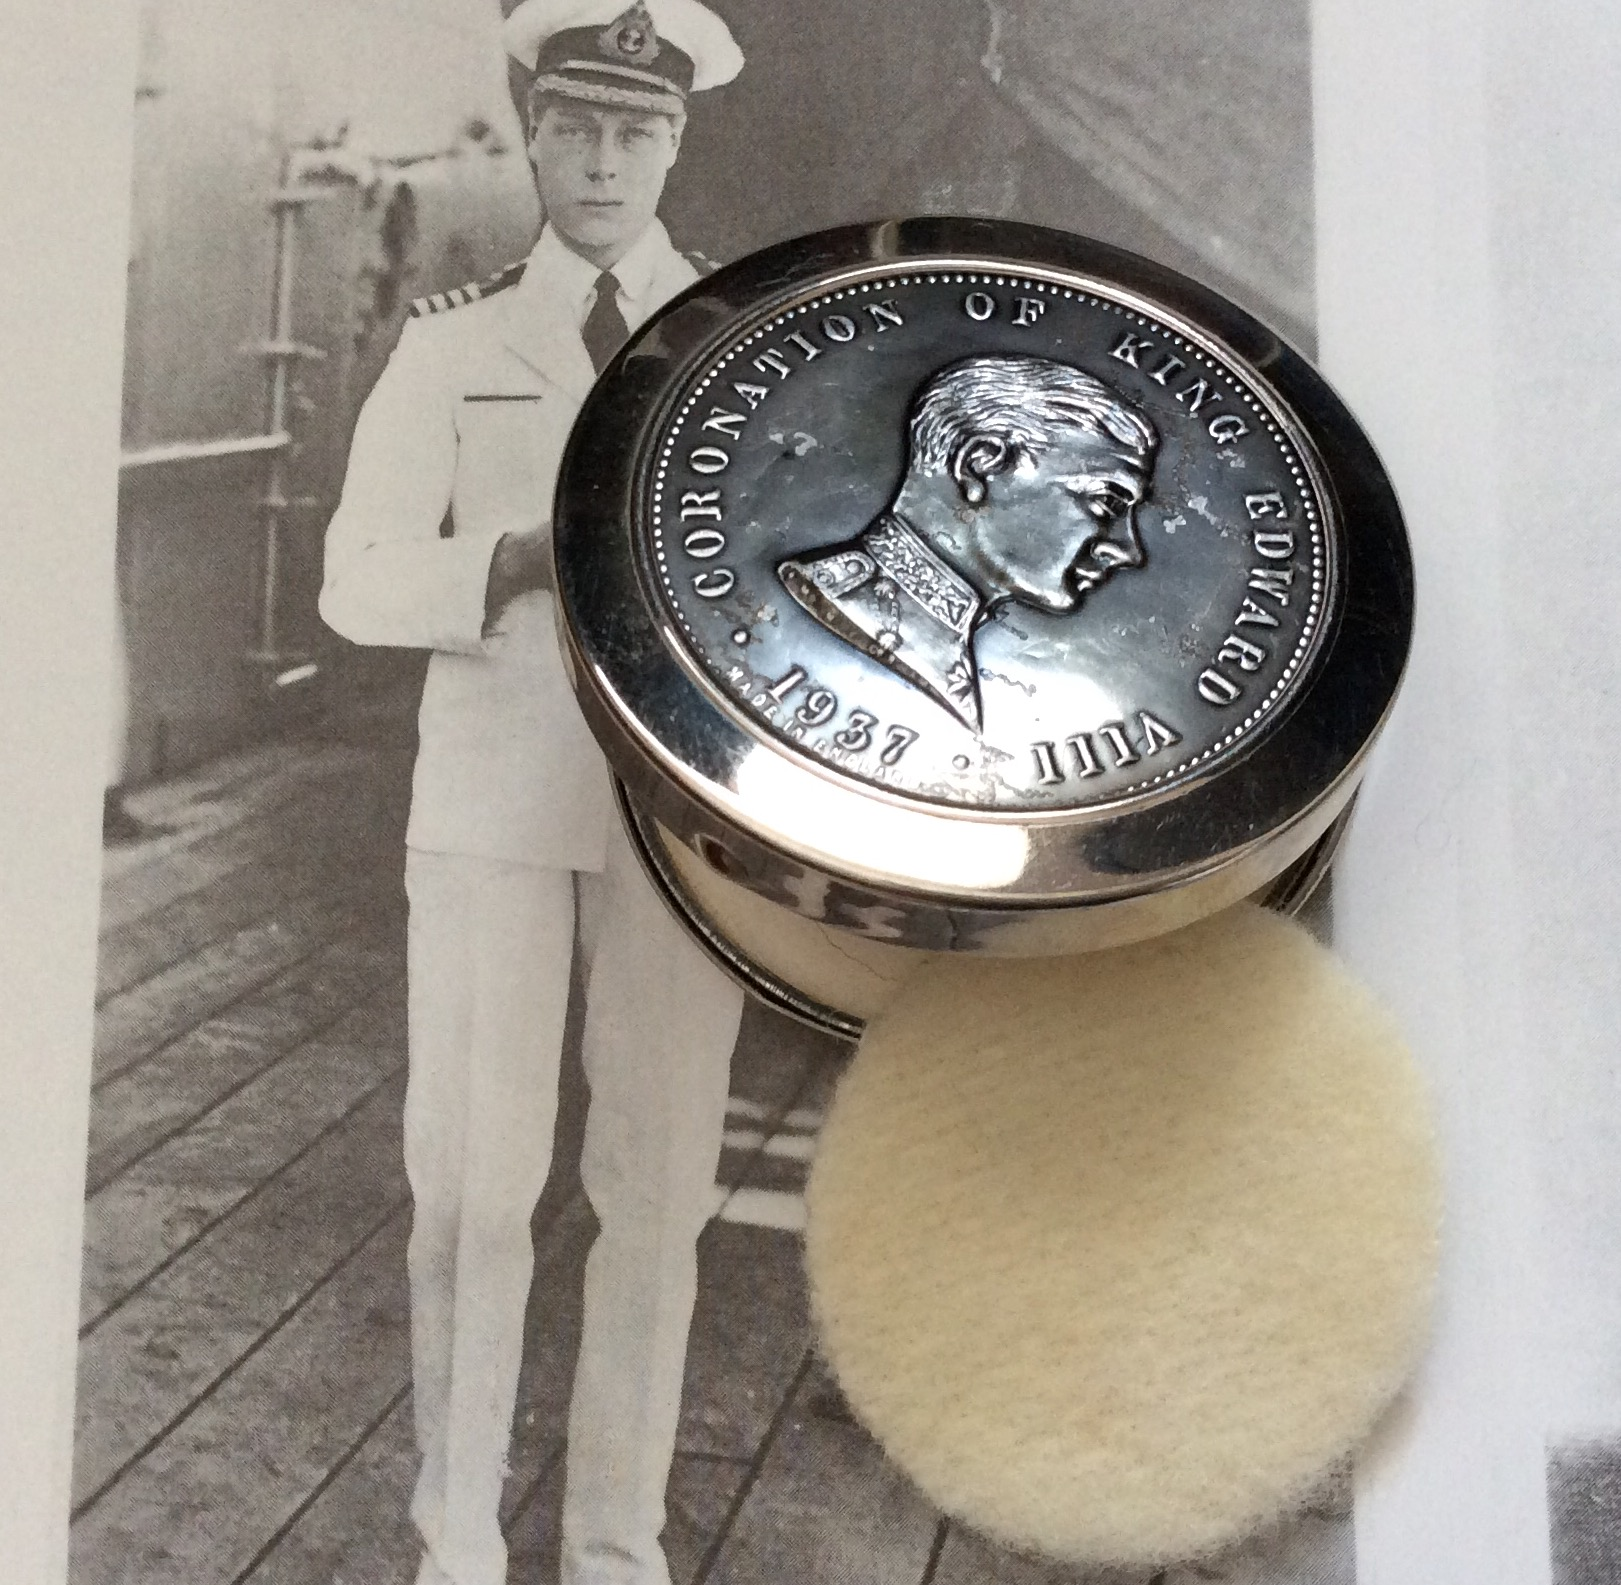 Rare 1937 King Edward V111 Coronation Powder Compact Size: 4.5cm dia.